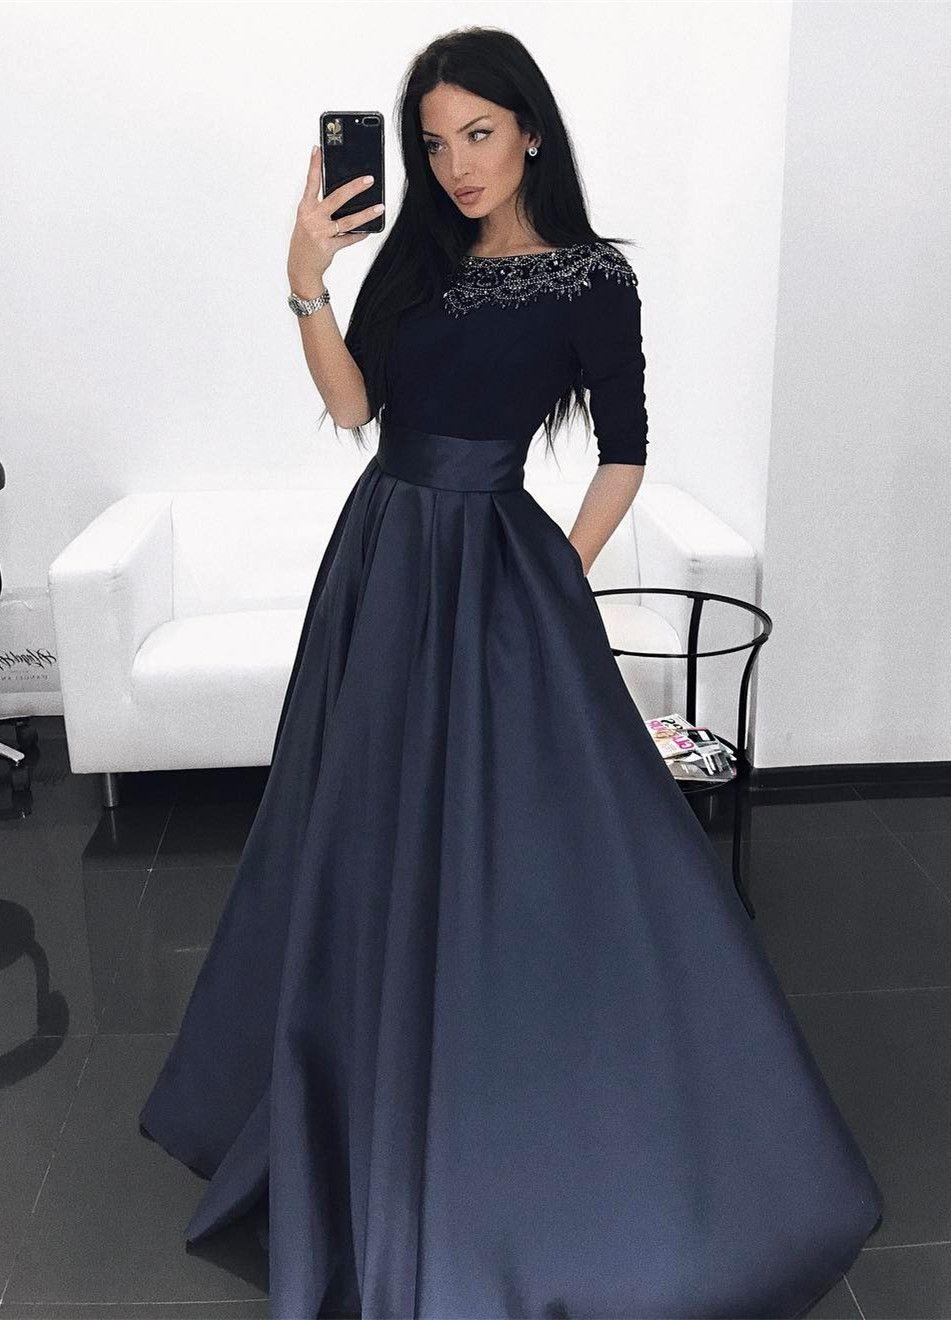 Aline bateau dark navy satin evening prom dress with beading in